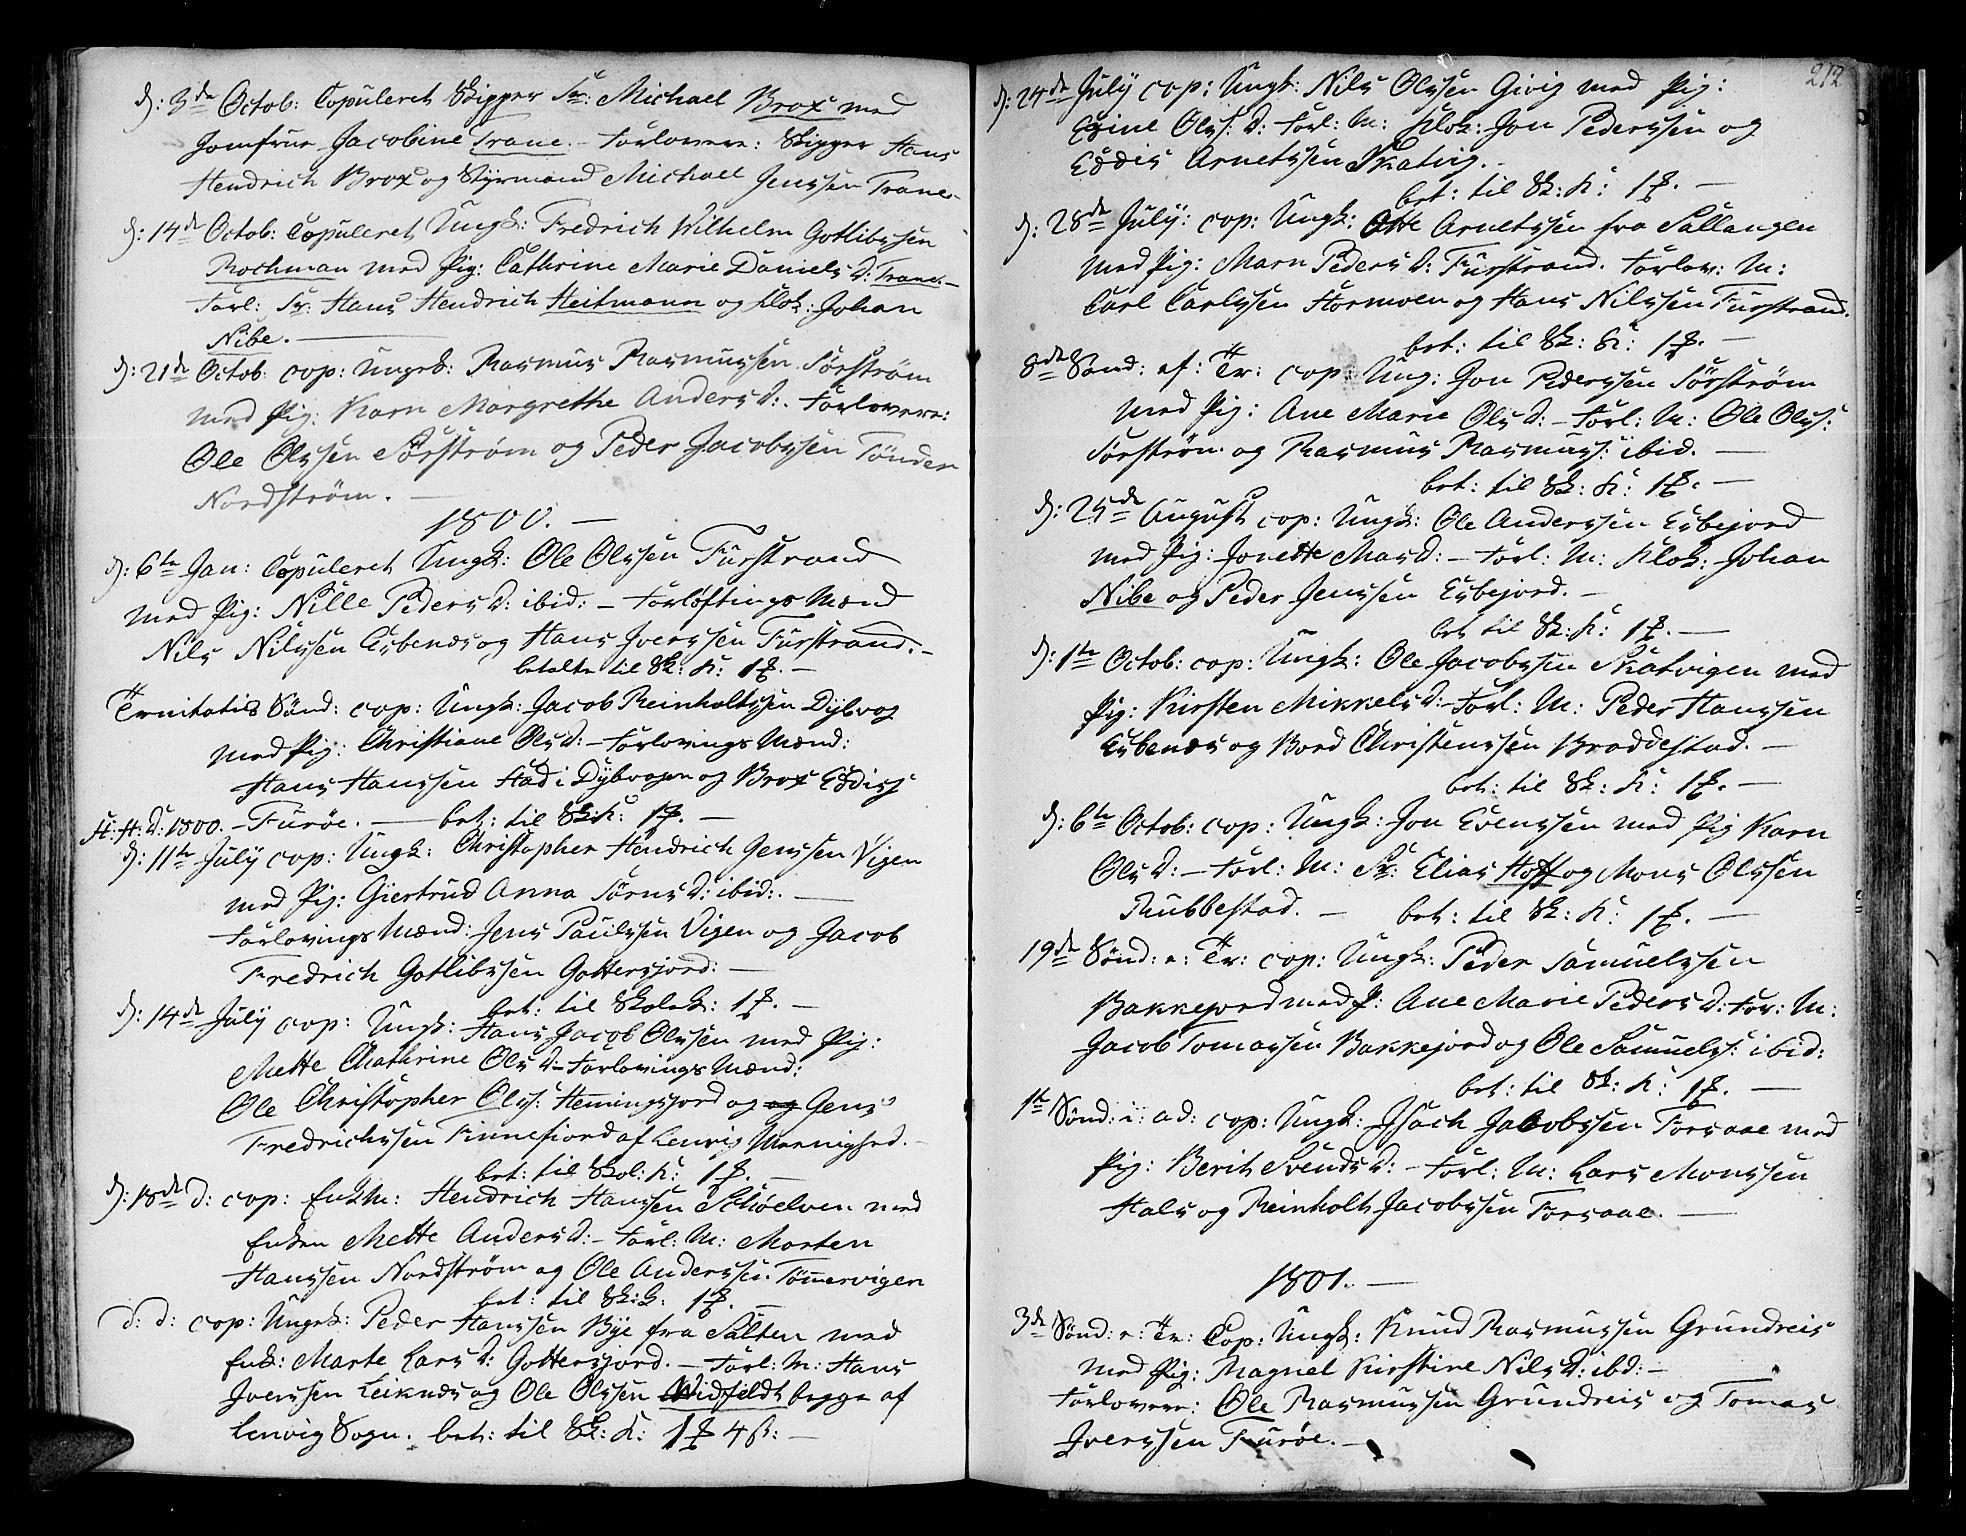 SATØ, Tranøy sokneprestkontor, I/Ia/Iaa/L0002kirke: Ministerialbok nr. 2, 1773-1806, s. 212